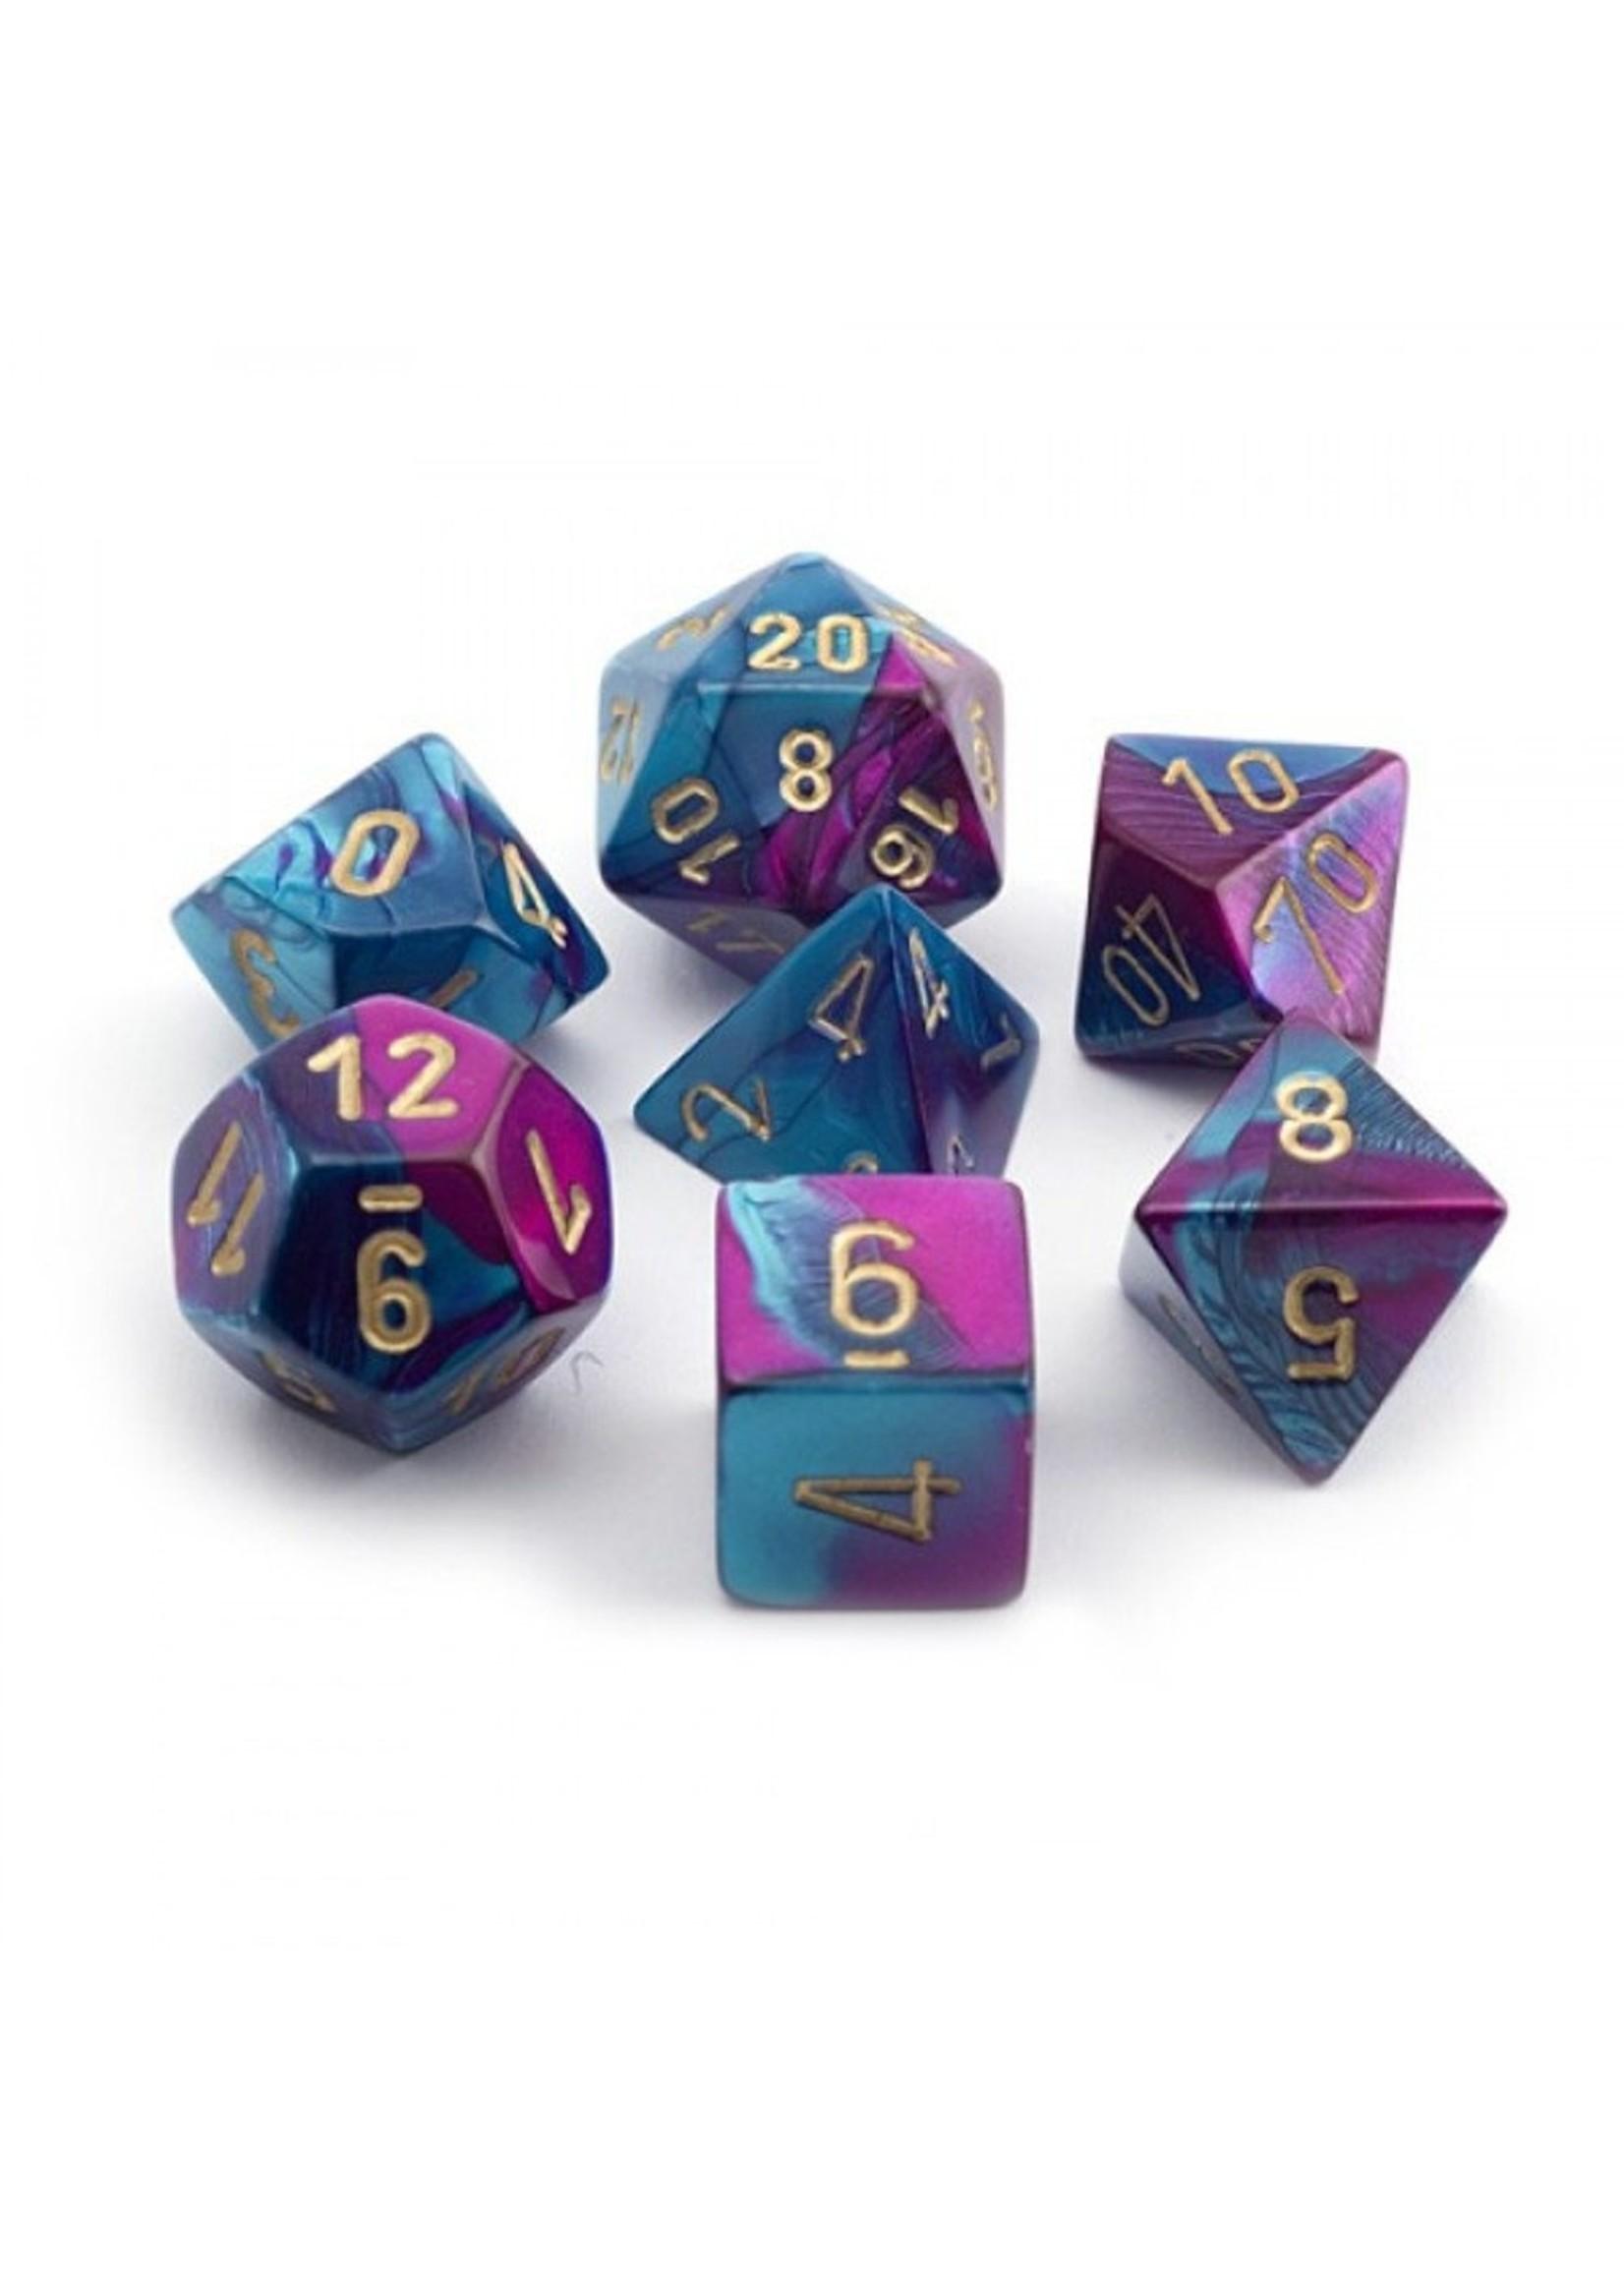 Gemini Polyhedral 7-Die Sets - Blue-Purple w/gold